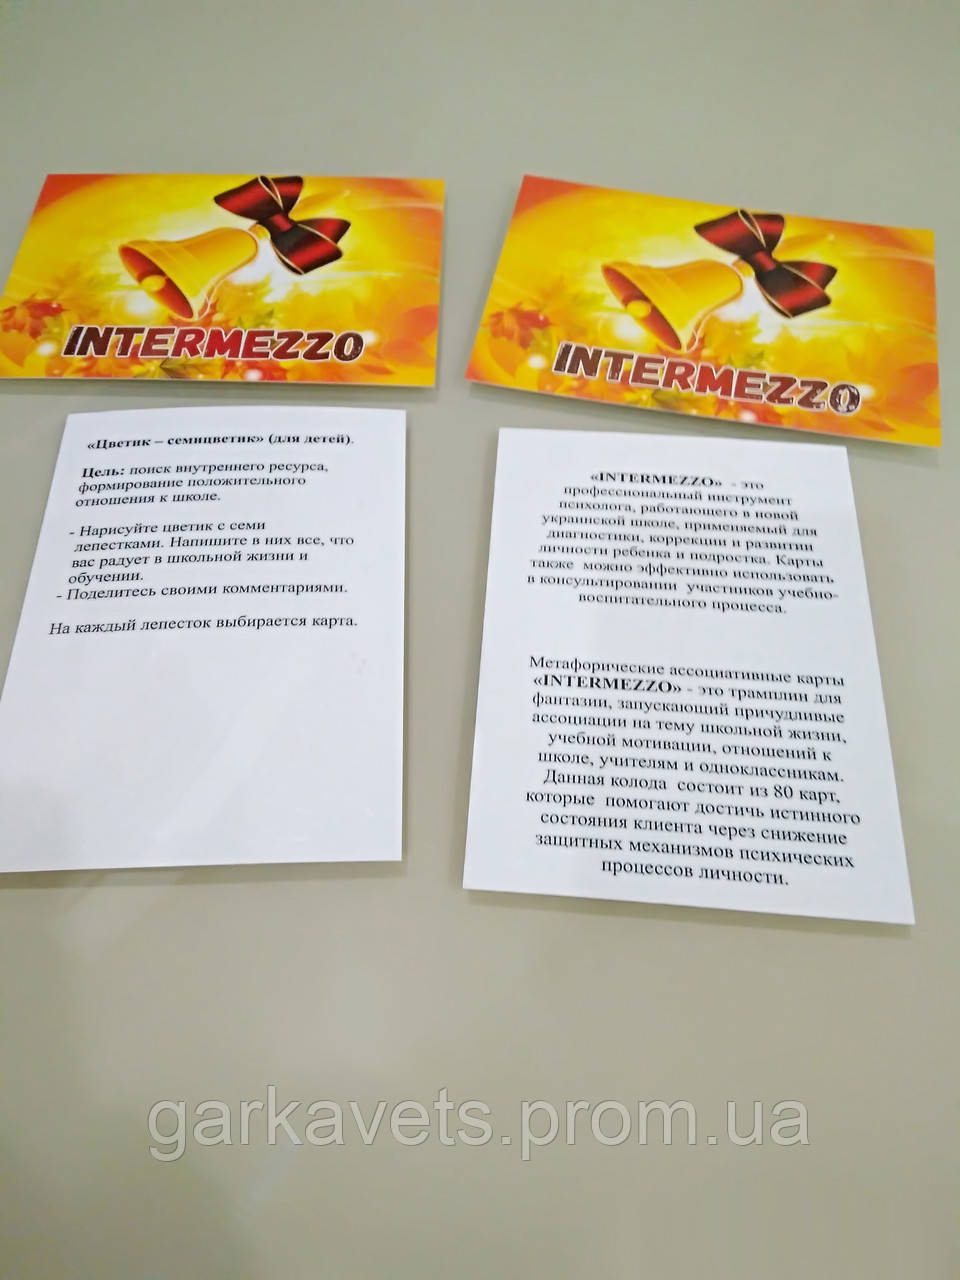 Метафорические карты «INTERMEZZO»